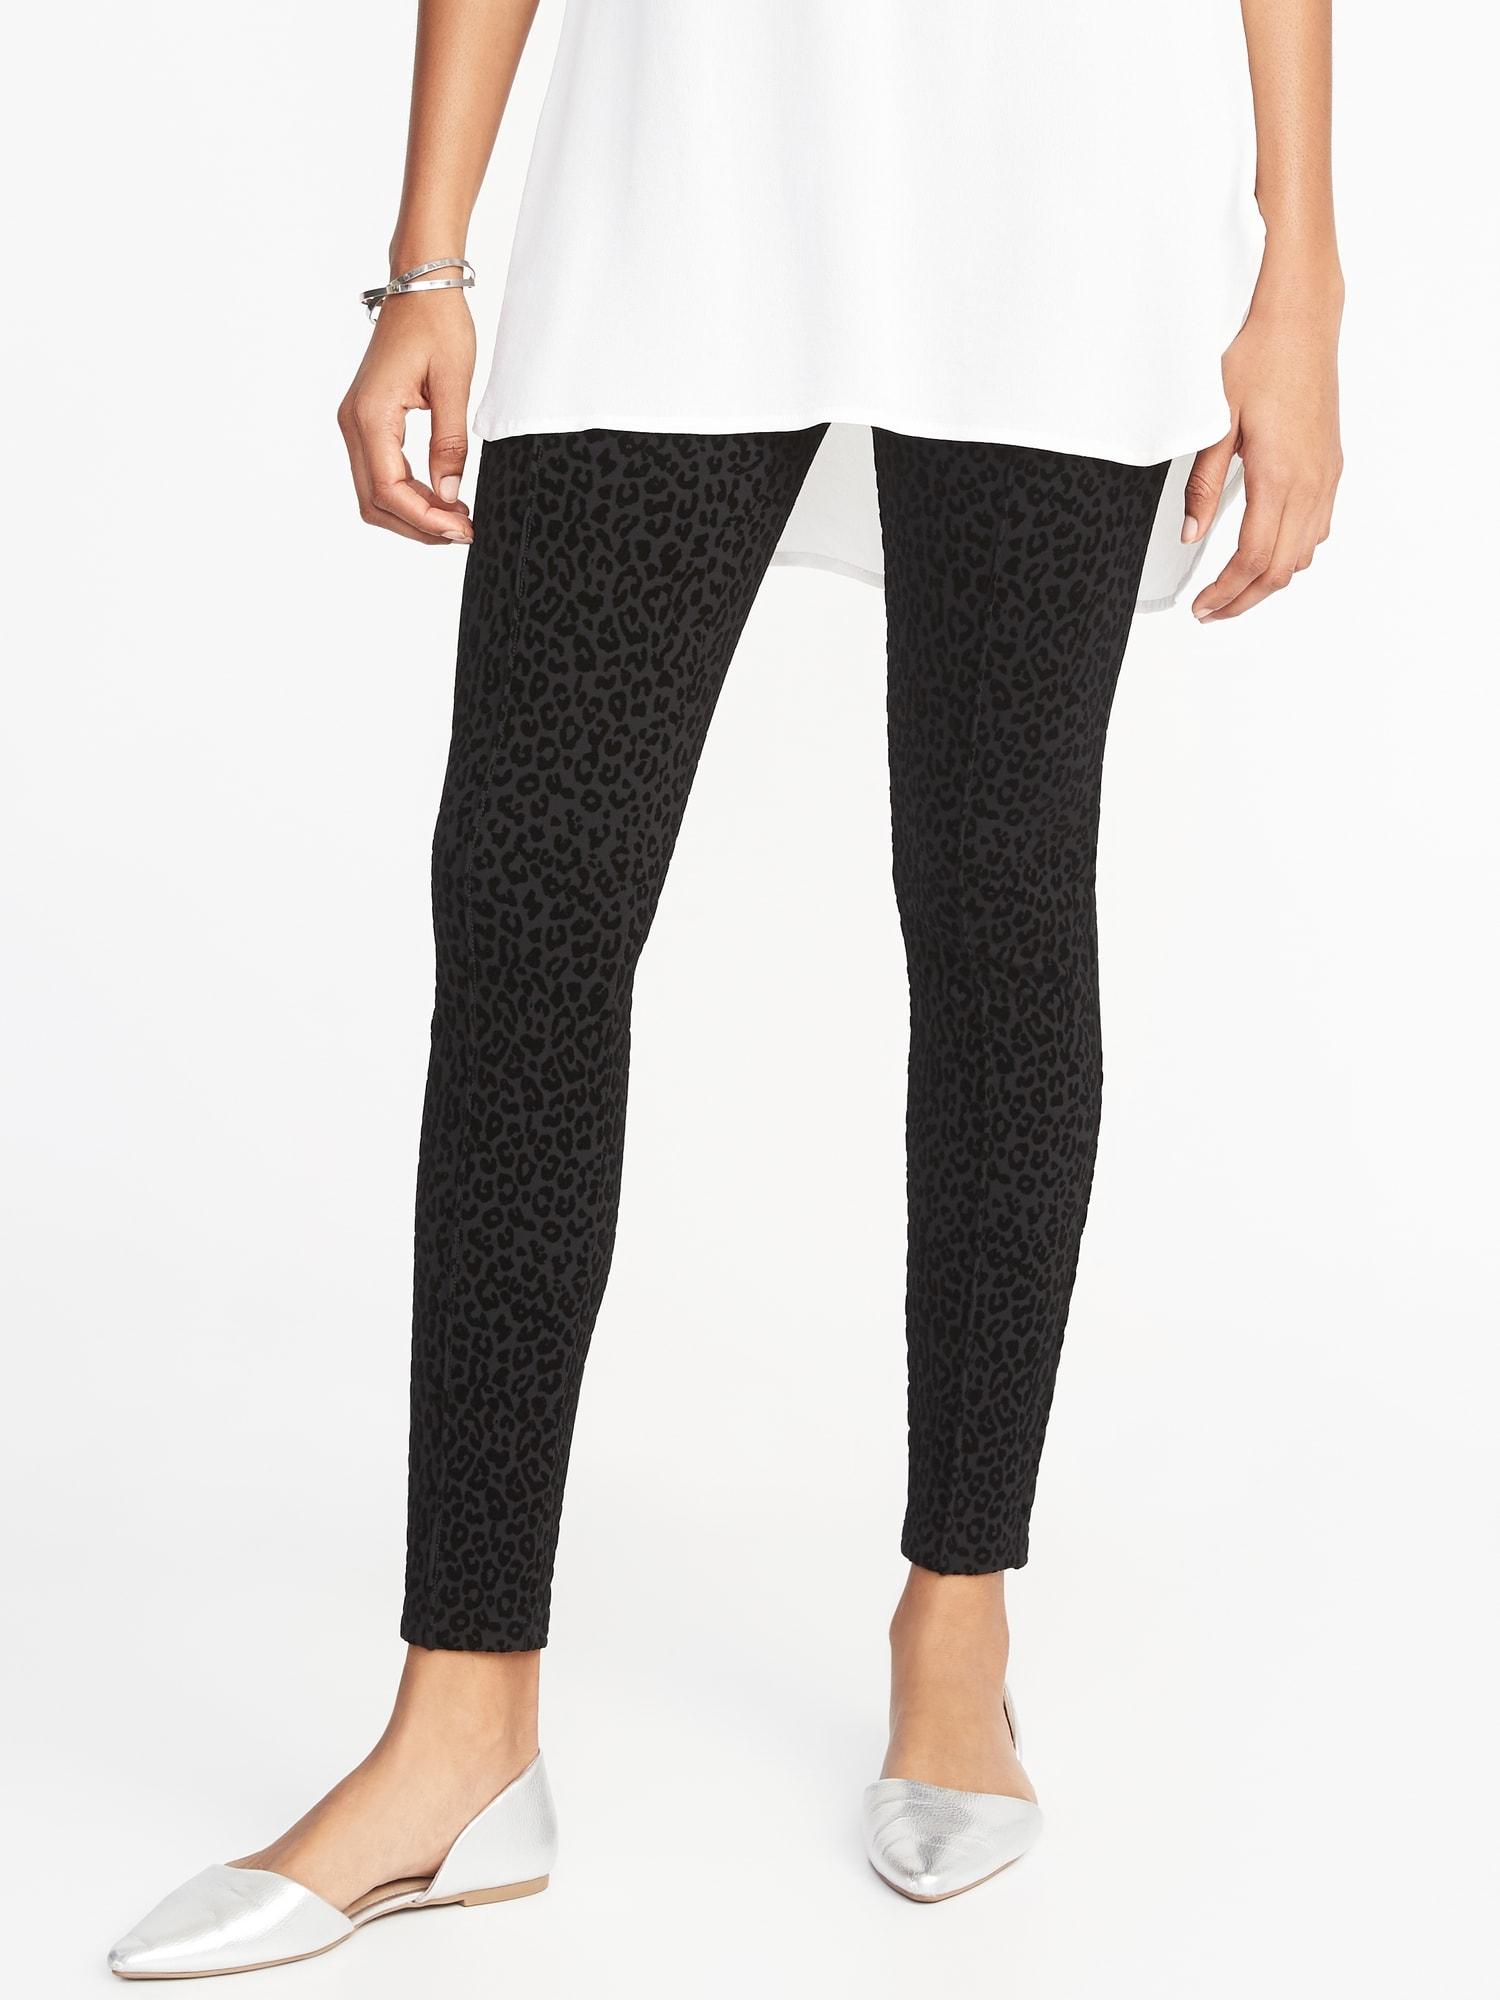 39976a7a9a7b3 High-Rise Ponte-Knit Stevie Pants for Women